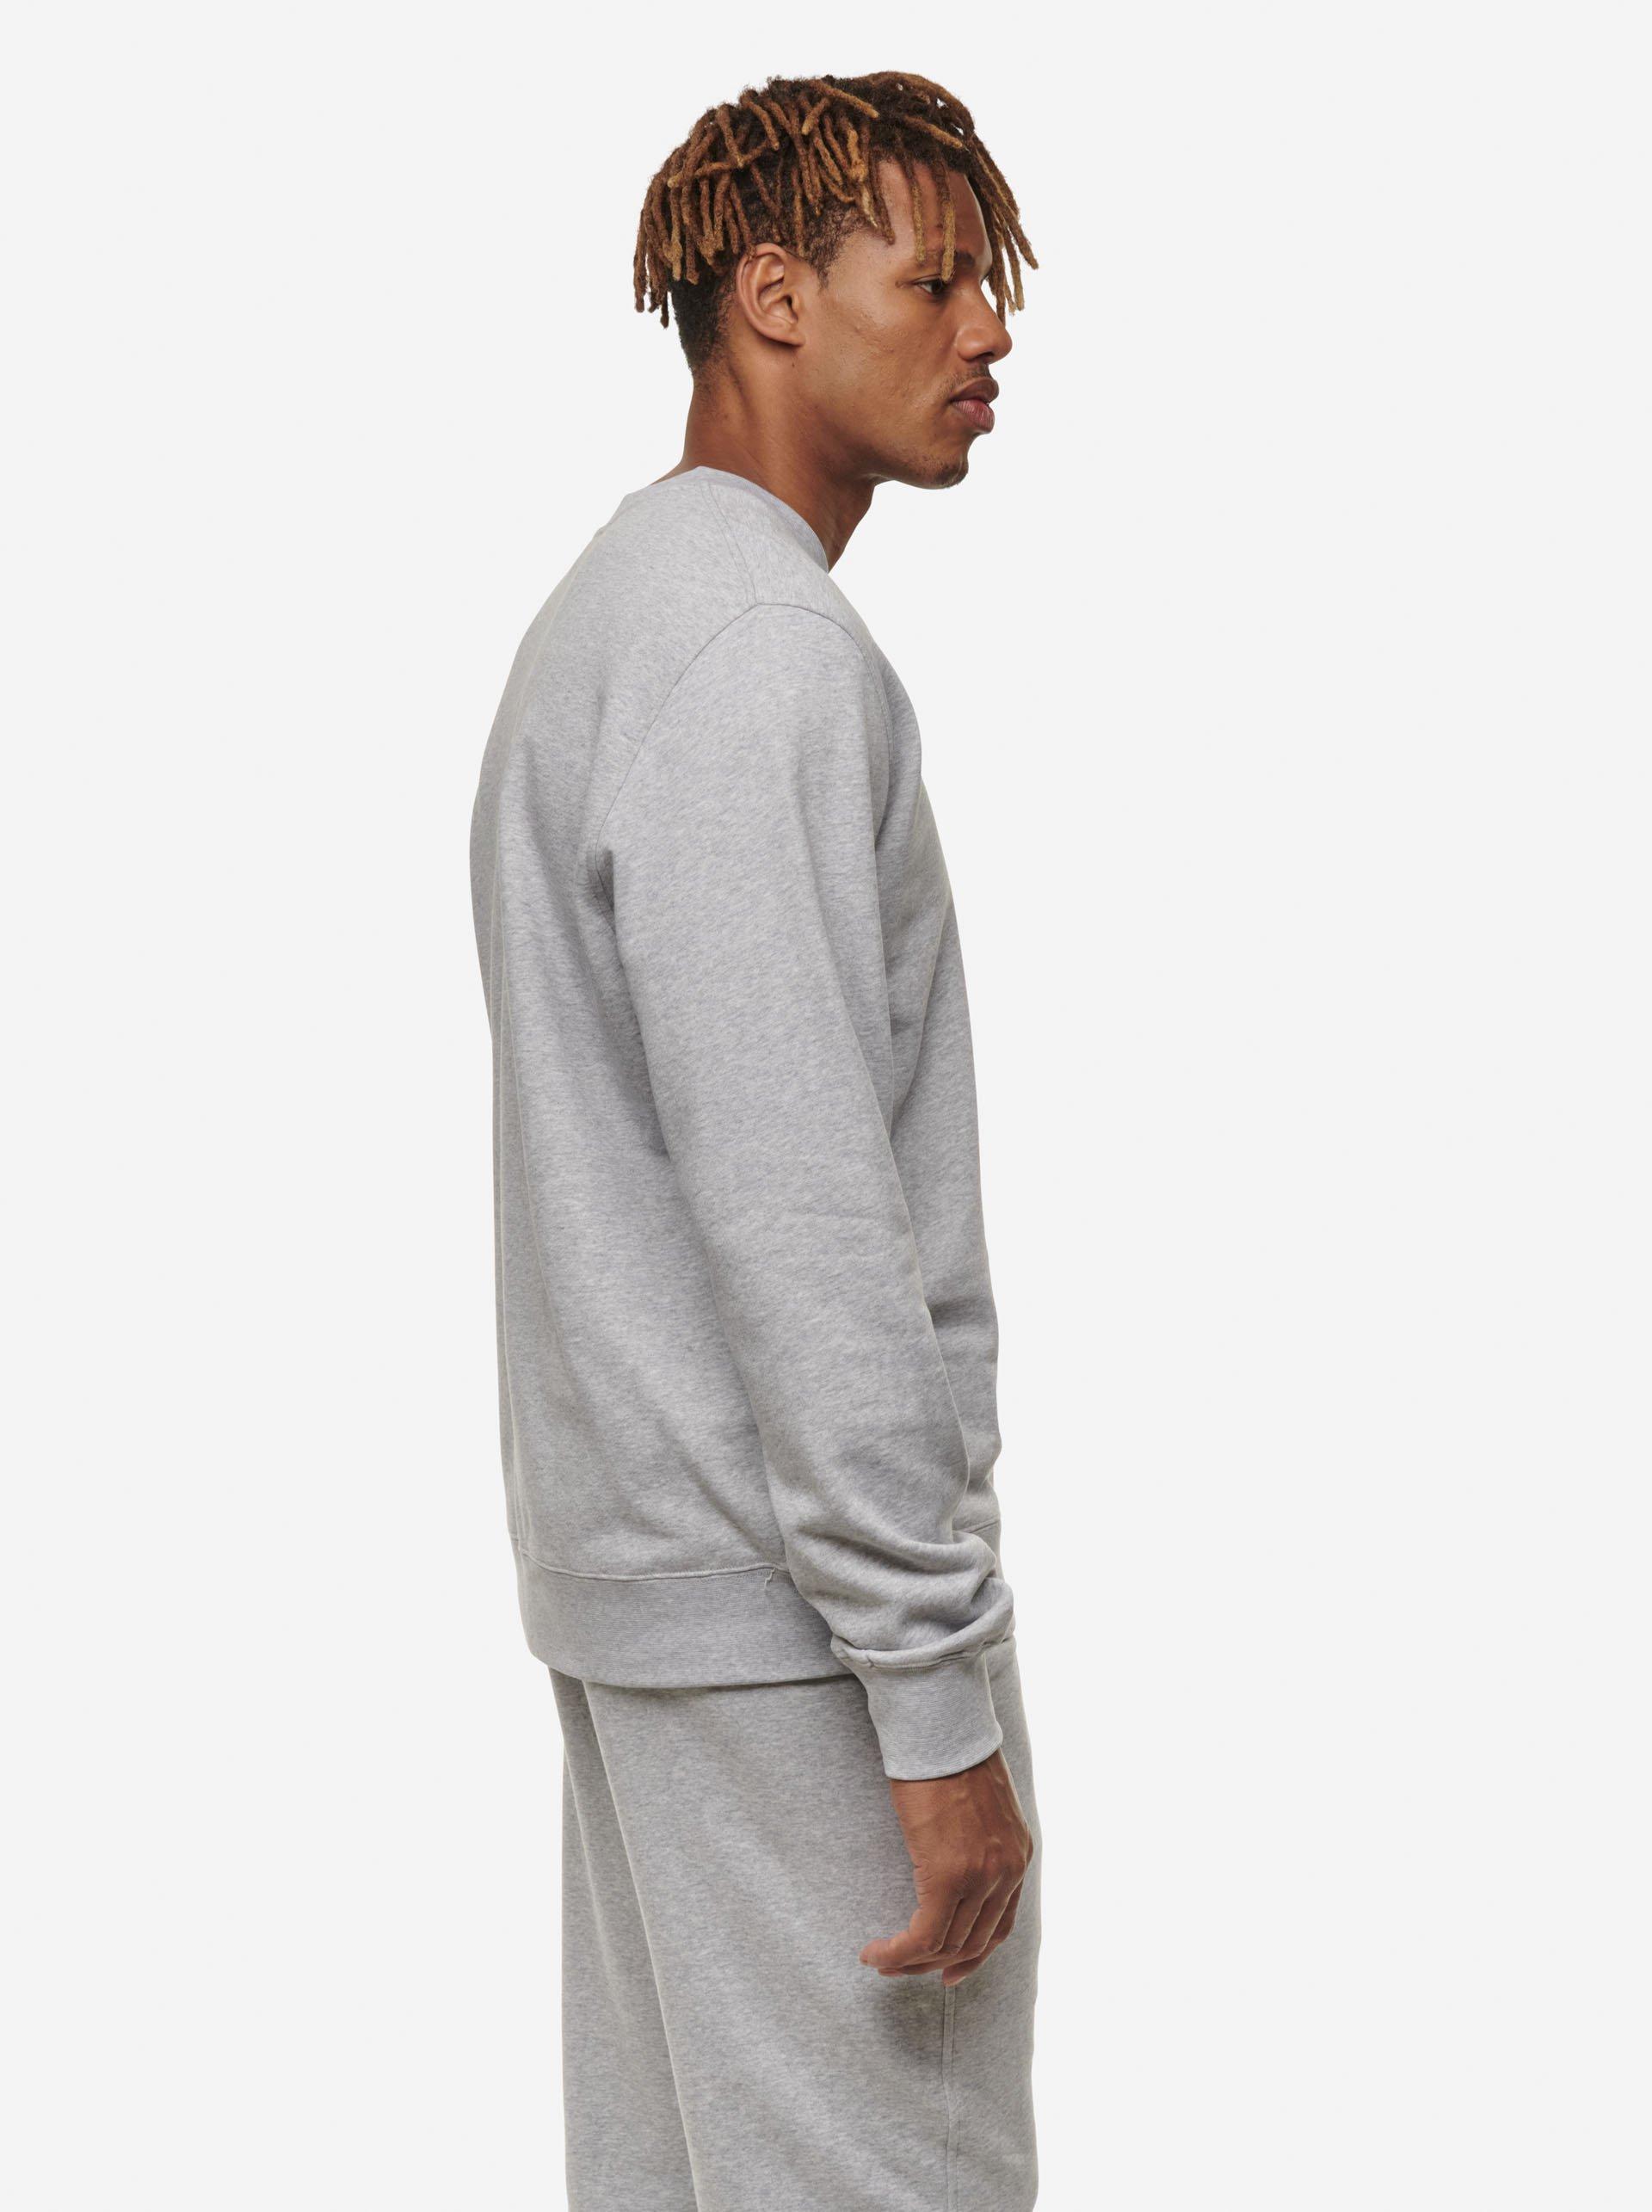 Teym-TheSweatshirt-Men-Grey04